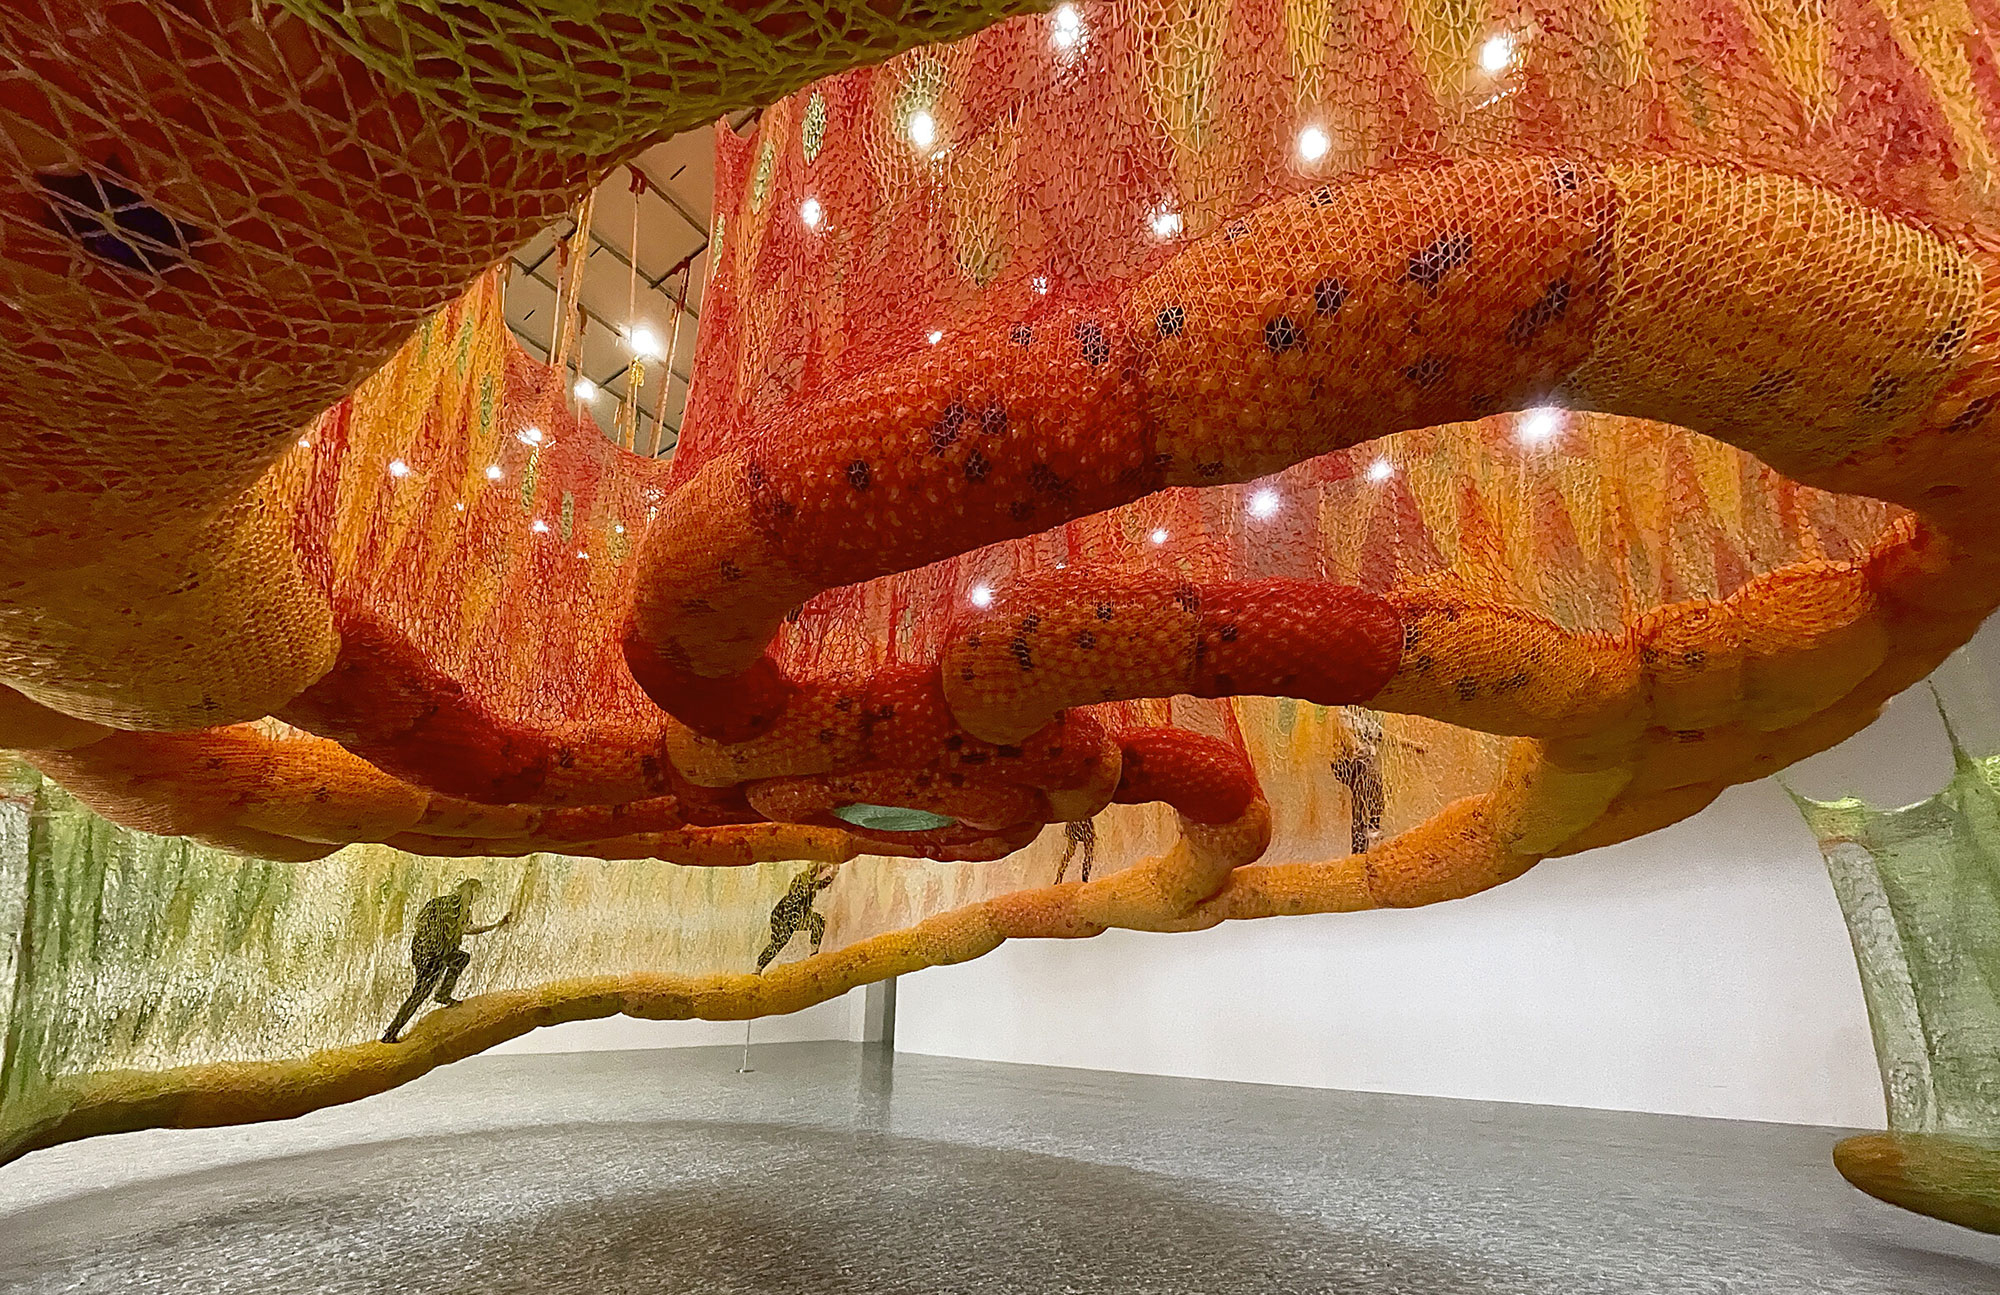 Artist Ernesto Neto crochets a 79-ft-long labyrinth inside Houston's Museum of Fine Arts